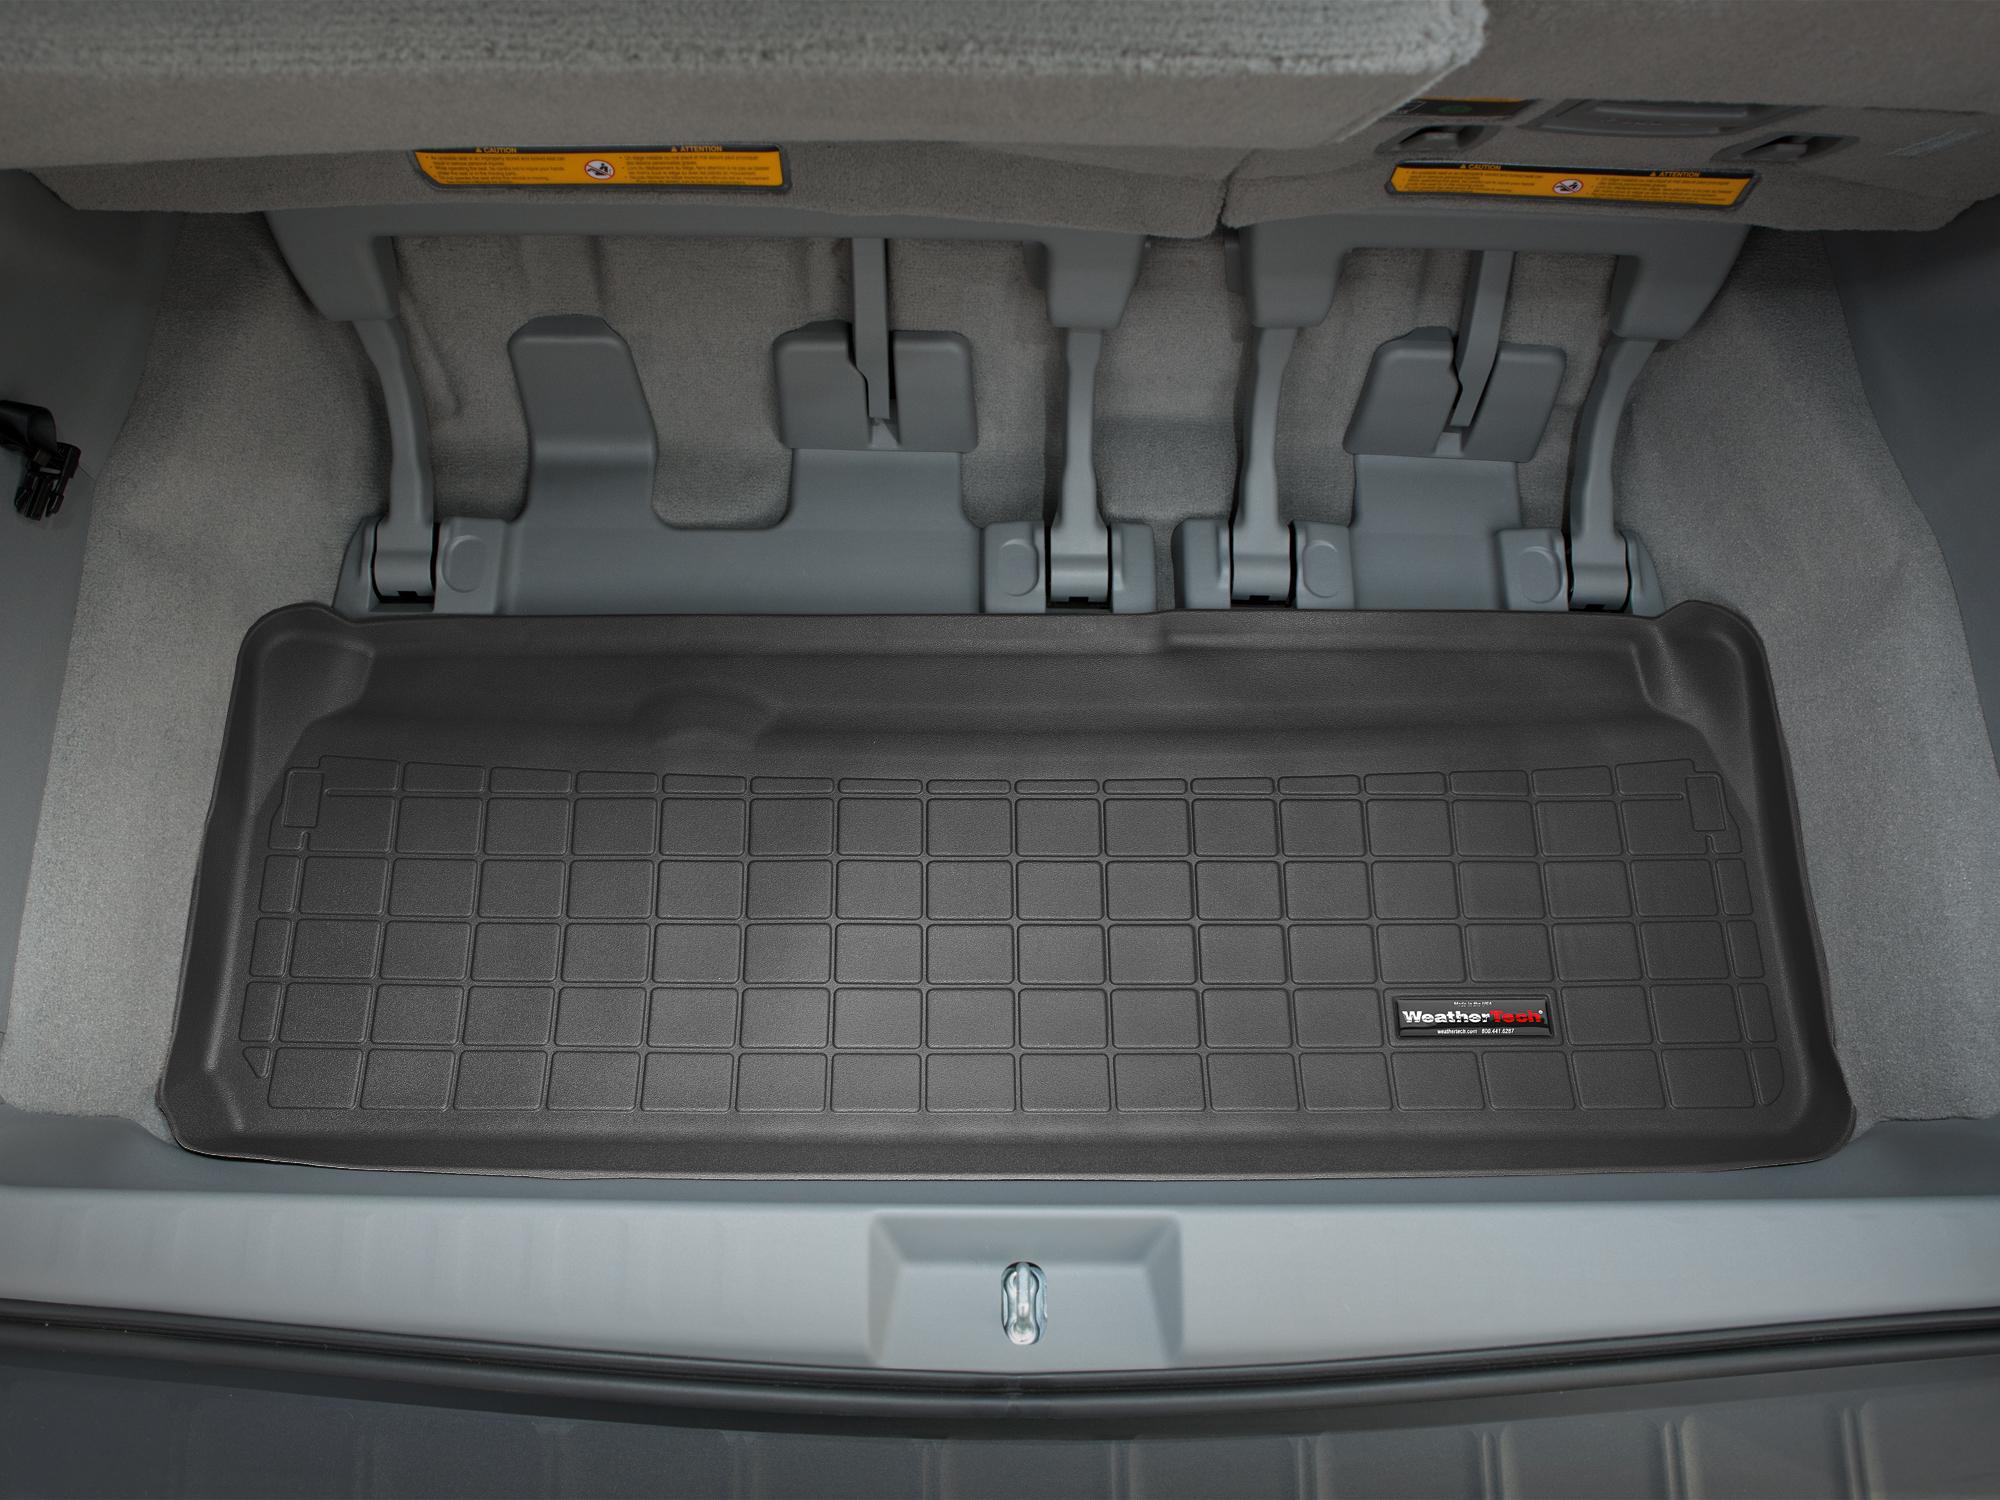 Toyota Sienna 2010>2017 Vasca baule WeatherTech bagagliaio nero *1306*